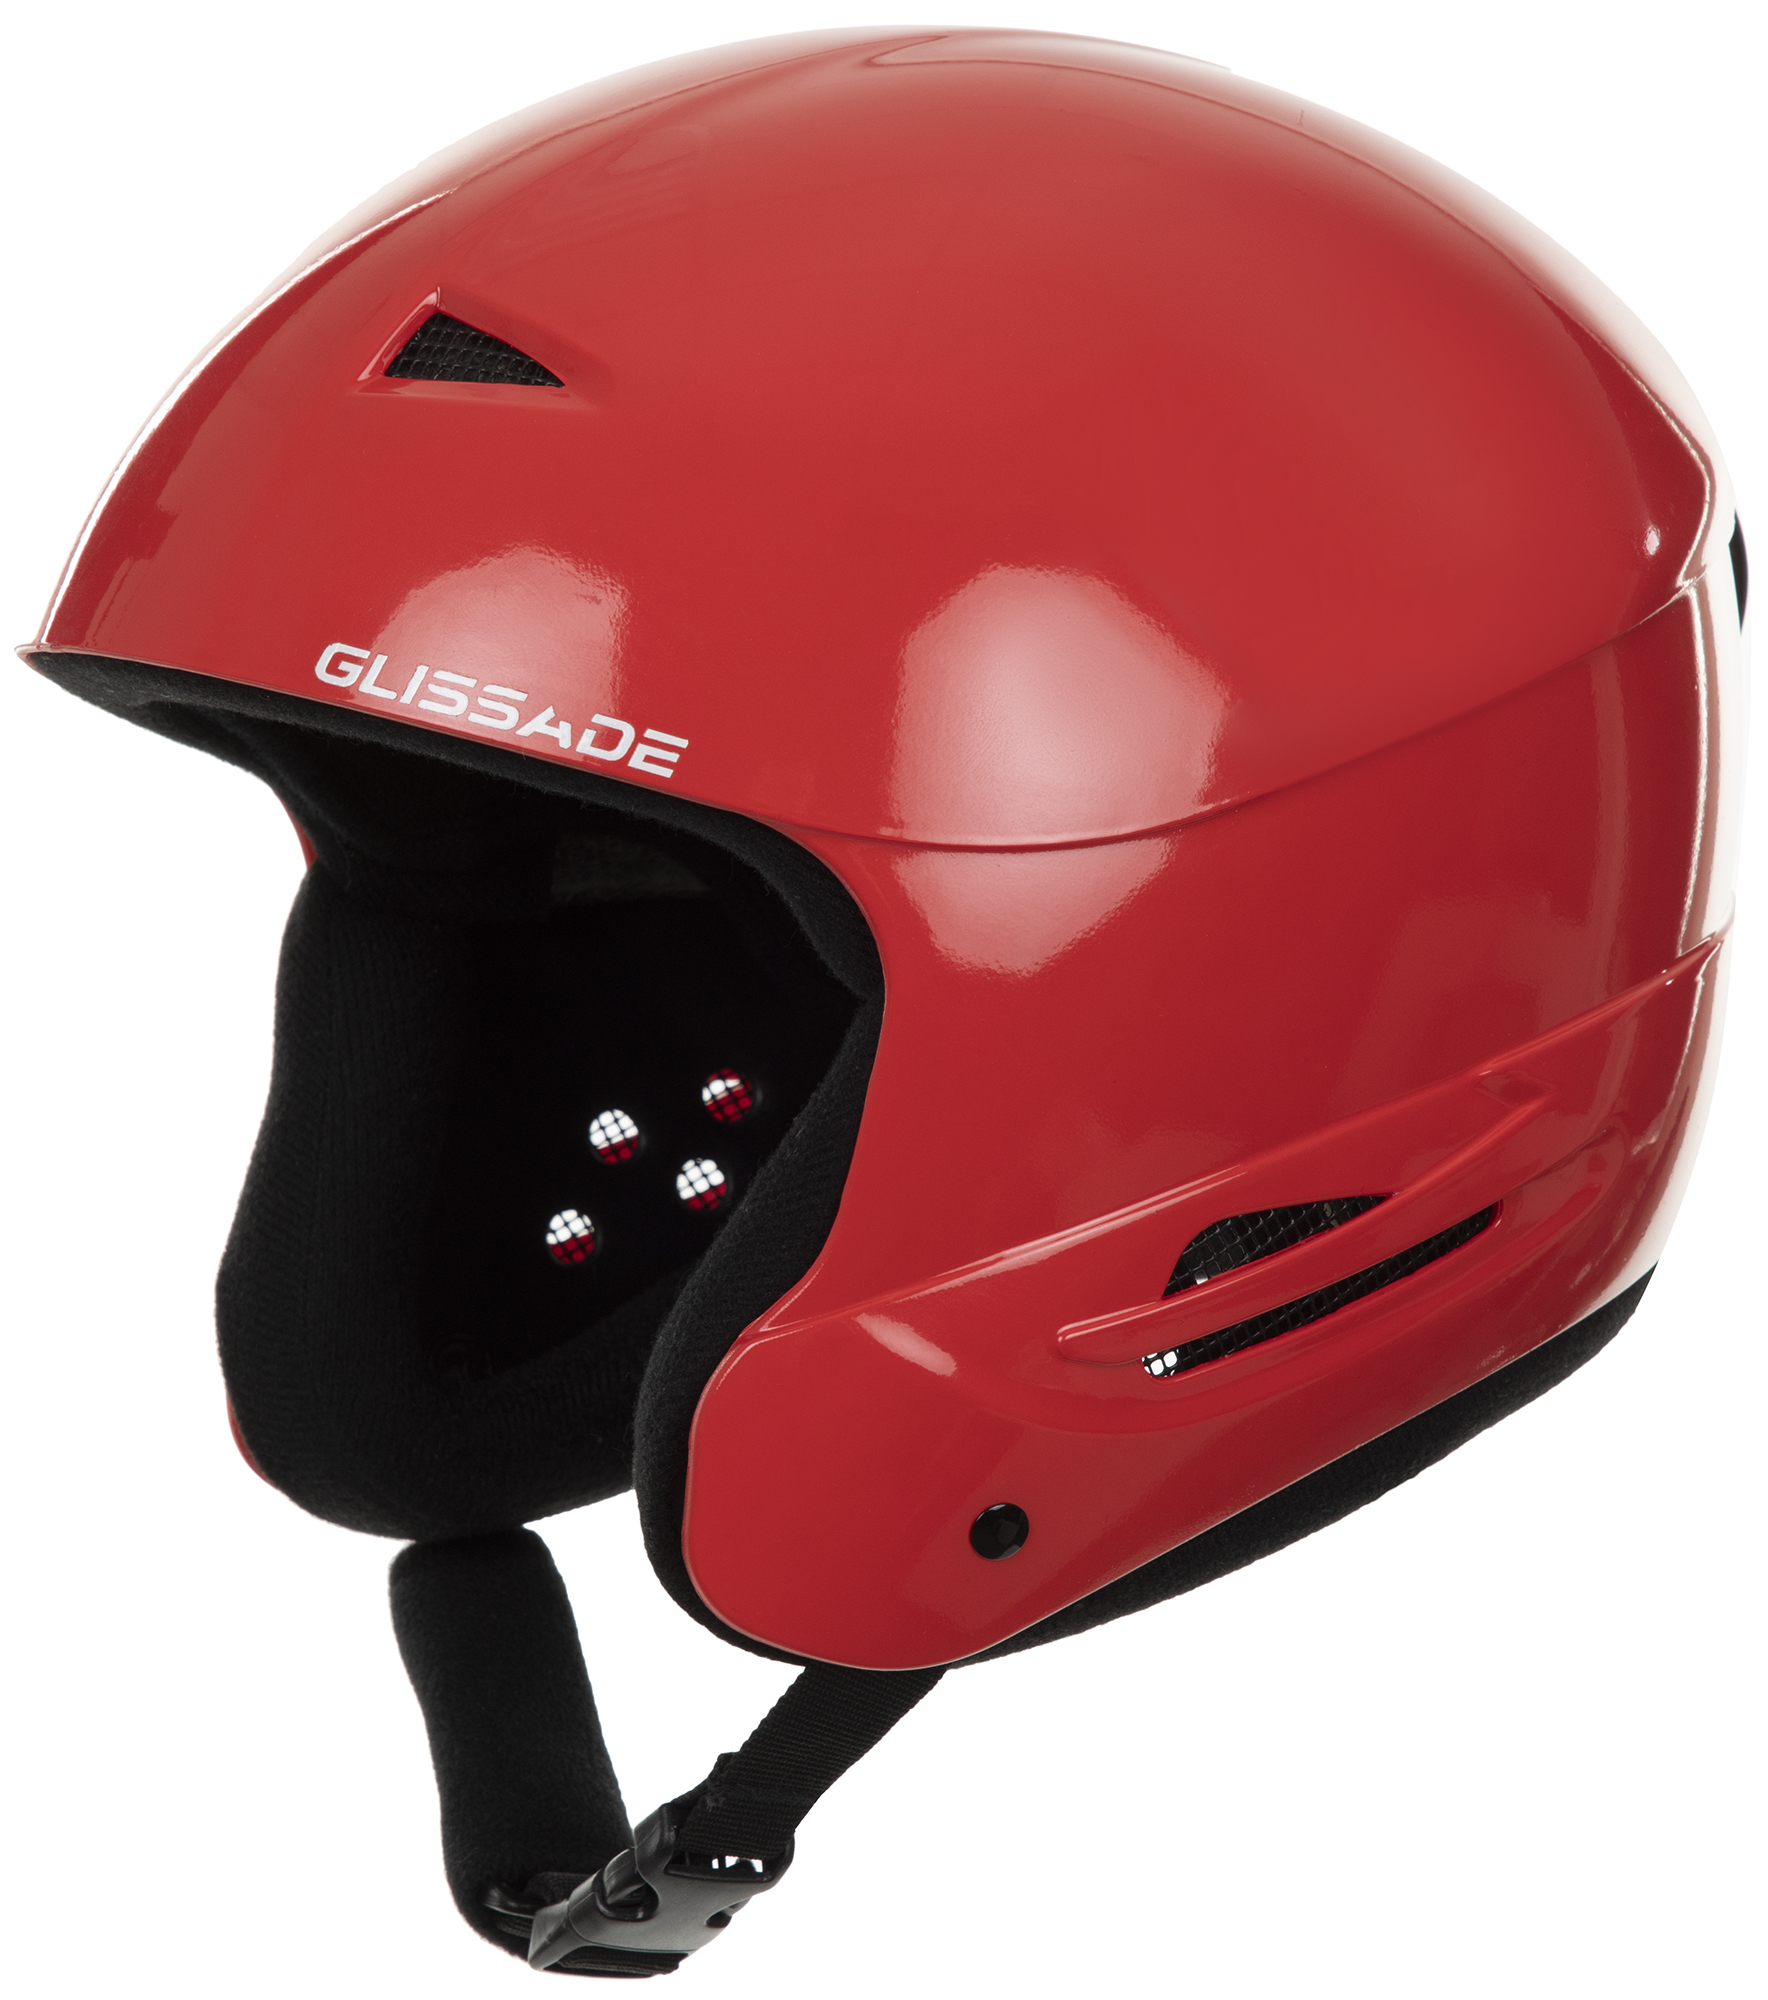 Glissade Шлем детский Glissade Glider, размер 51-53 шлем для сноуборда детский roxy happyland blue